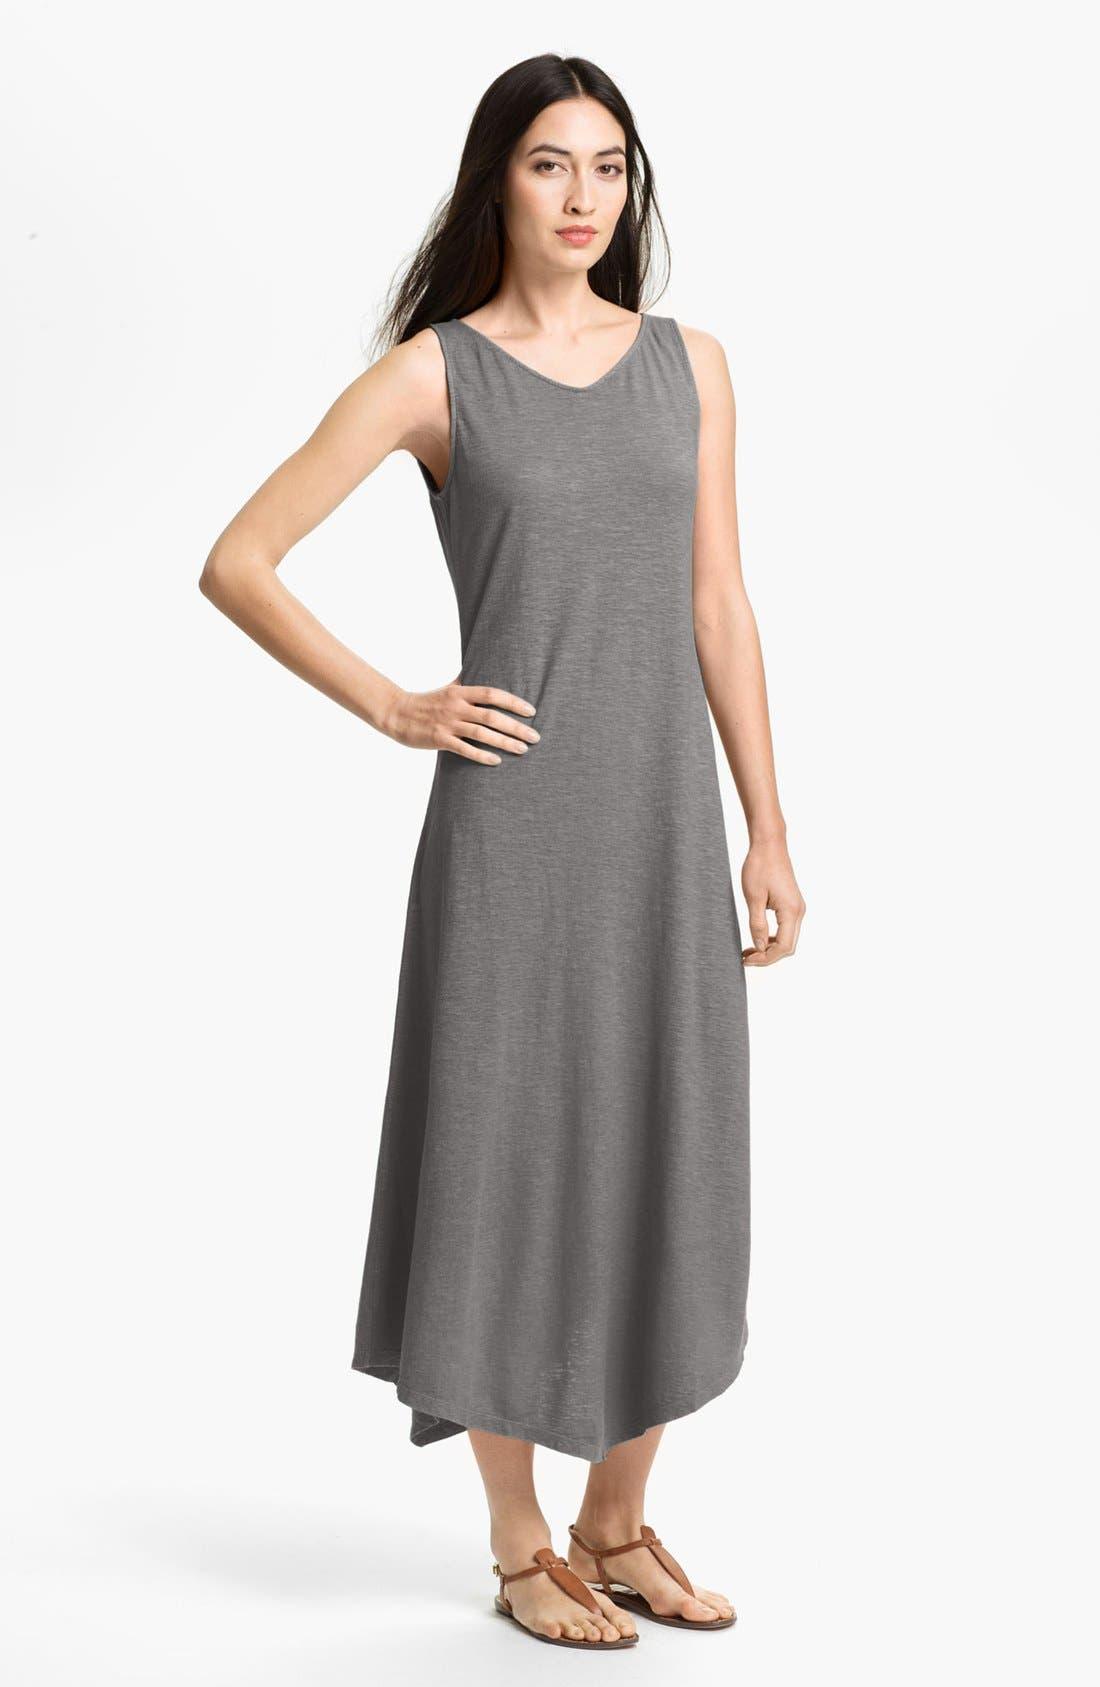 Alternate Image 1 Selected - Eileen Fisher Wide V-Neck Midi Dress (Petite)